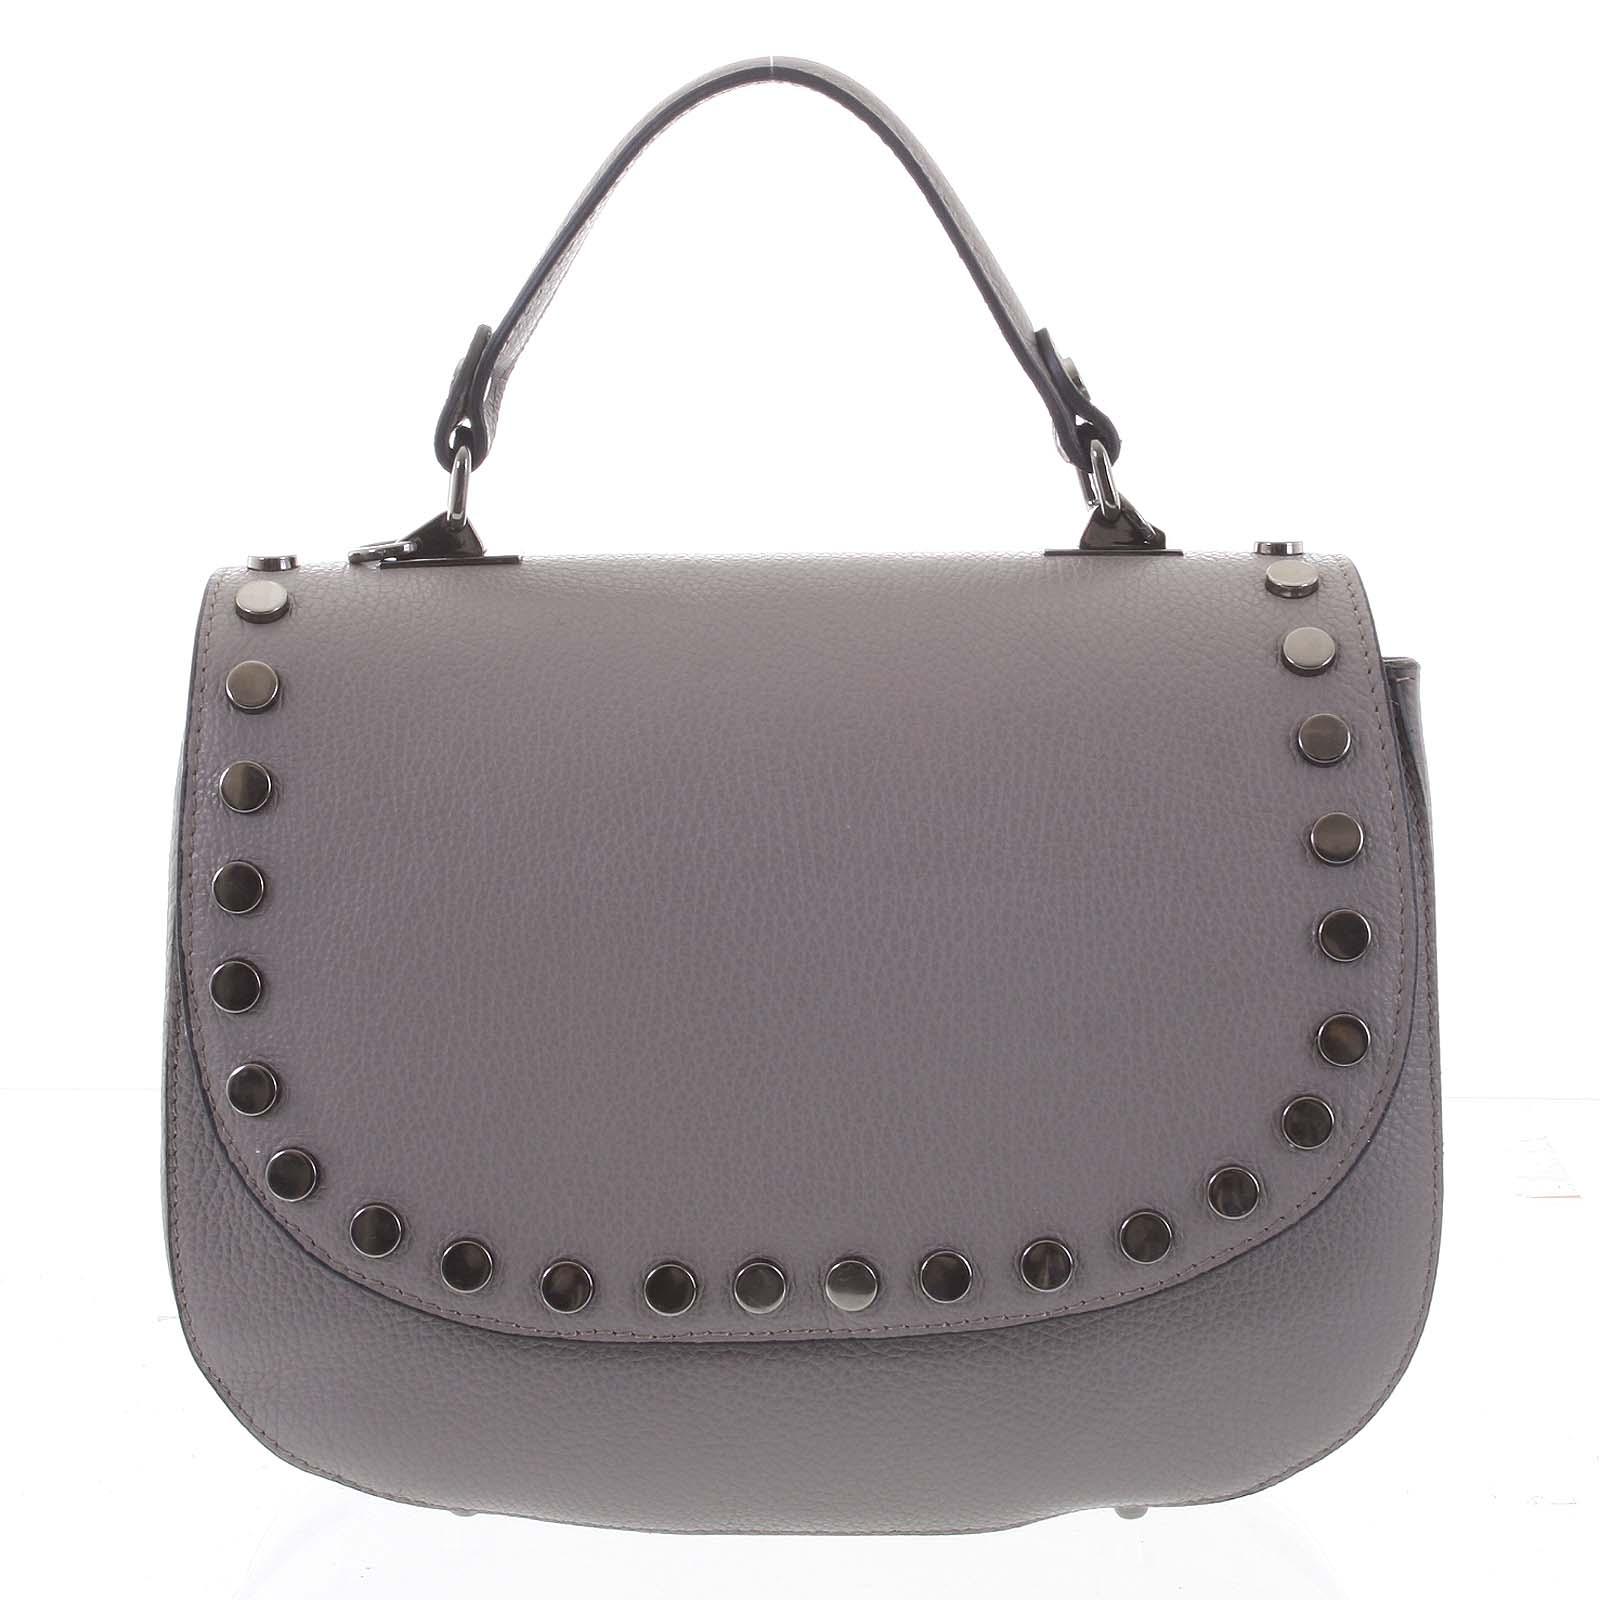 Originální zakulacená šedá kabelka do ruky - ItalY Aethra